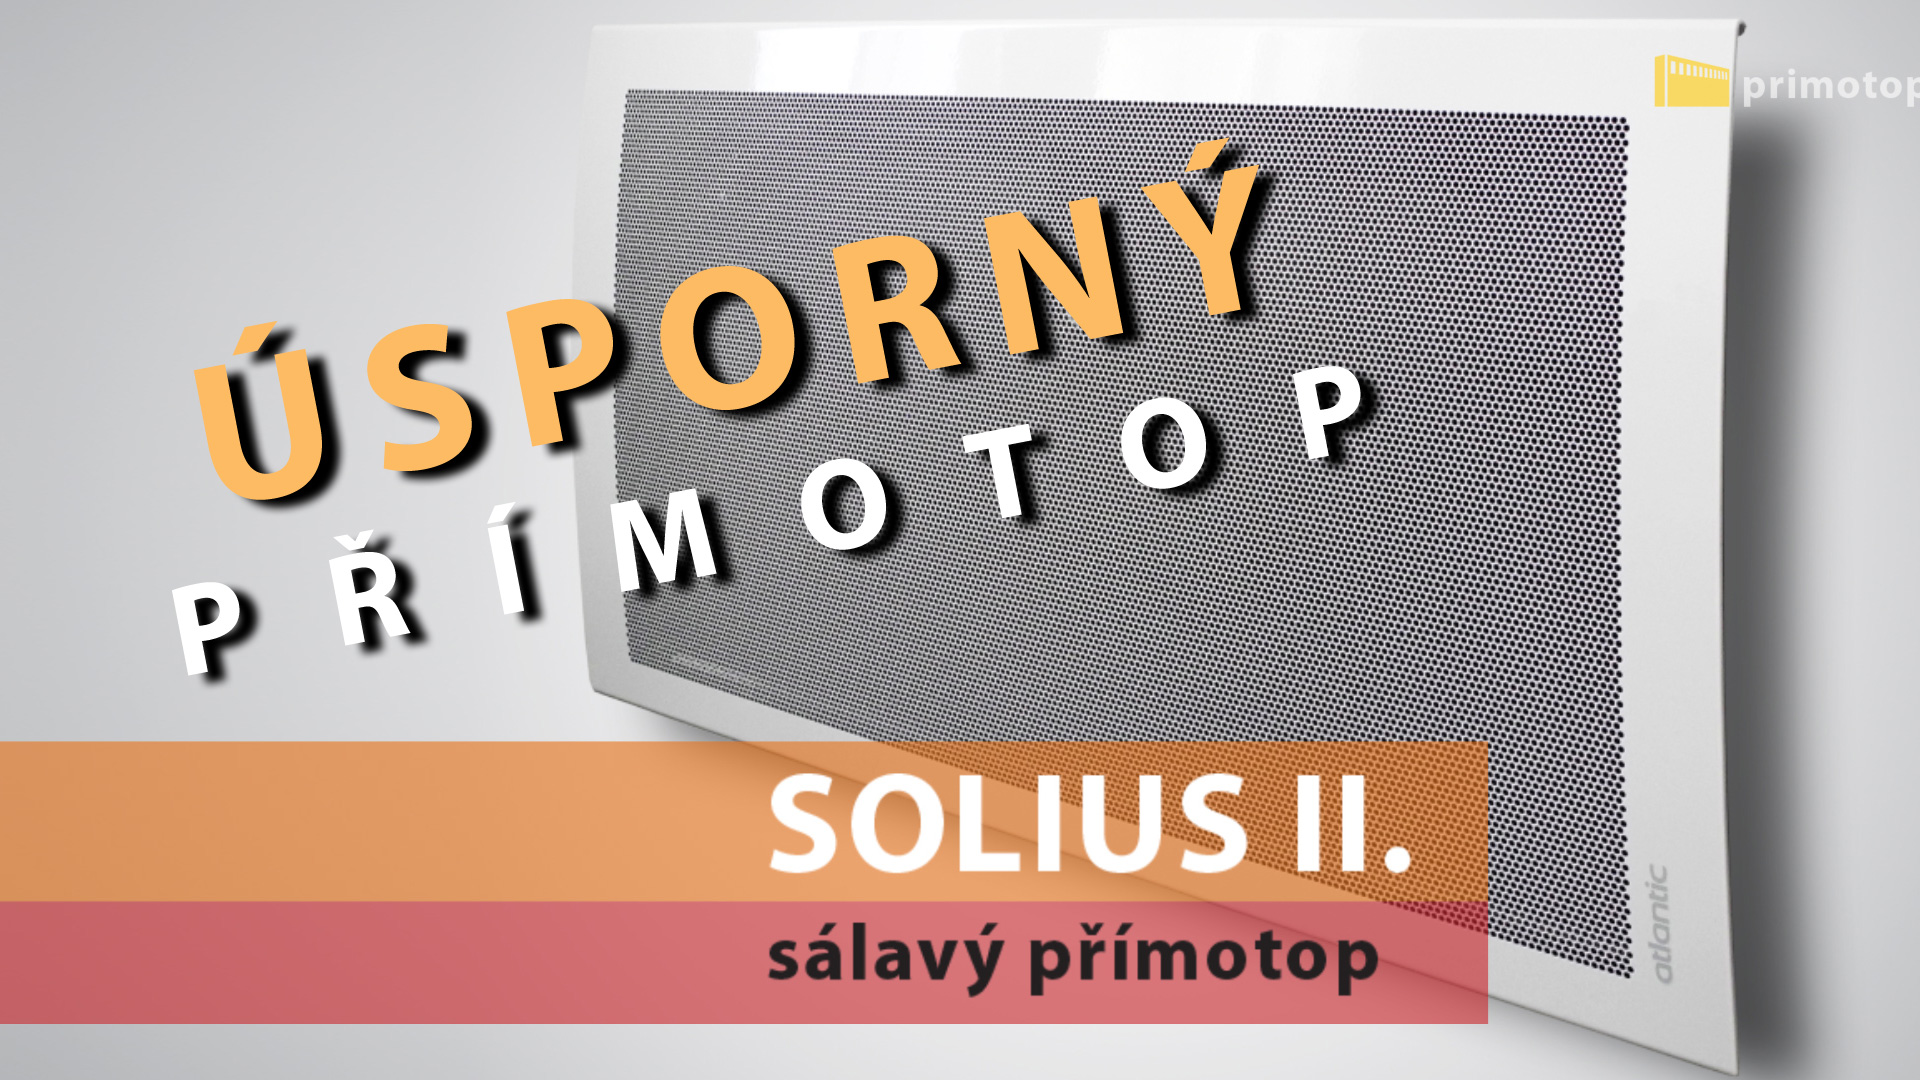 Sálavý přímotop ECOFLEX SOLIUS II